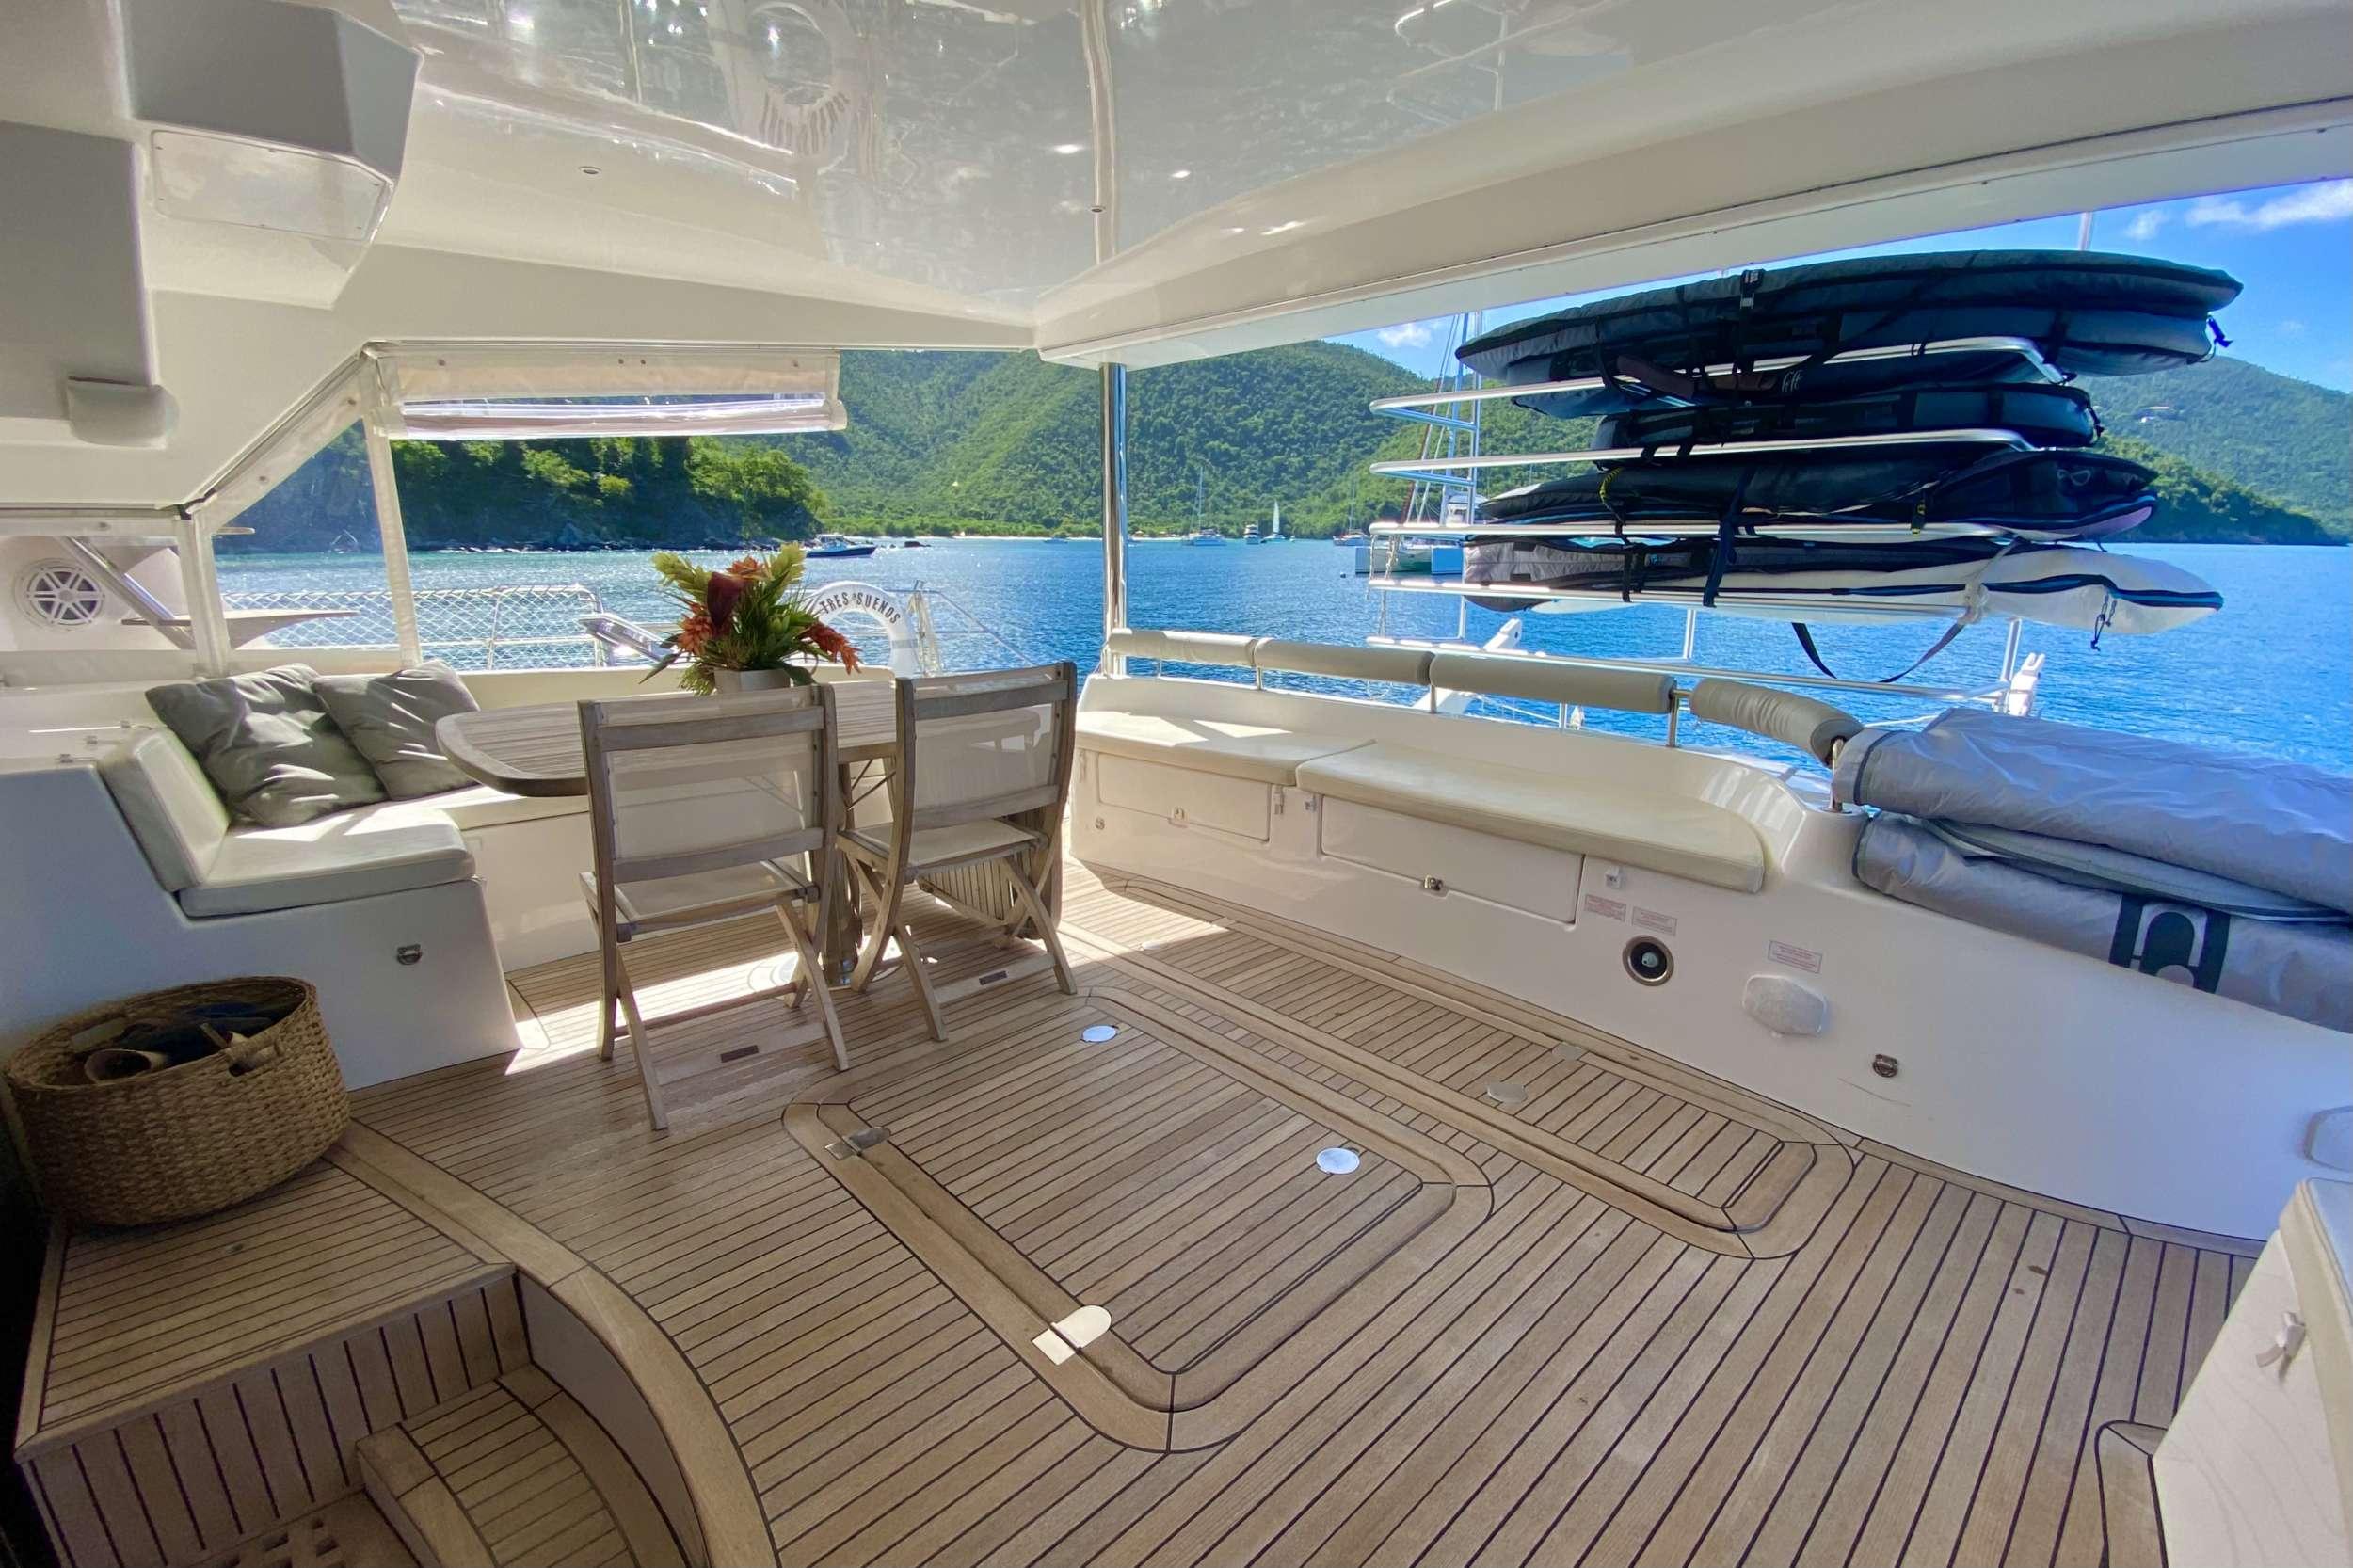 TRES SUENOS yacht image # 12